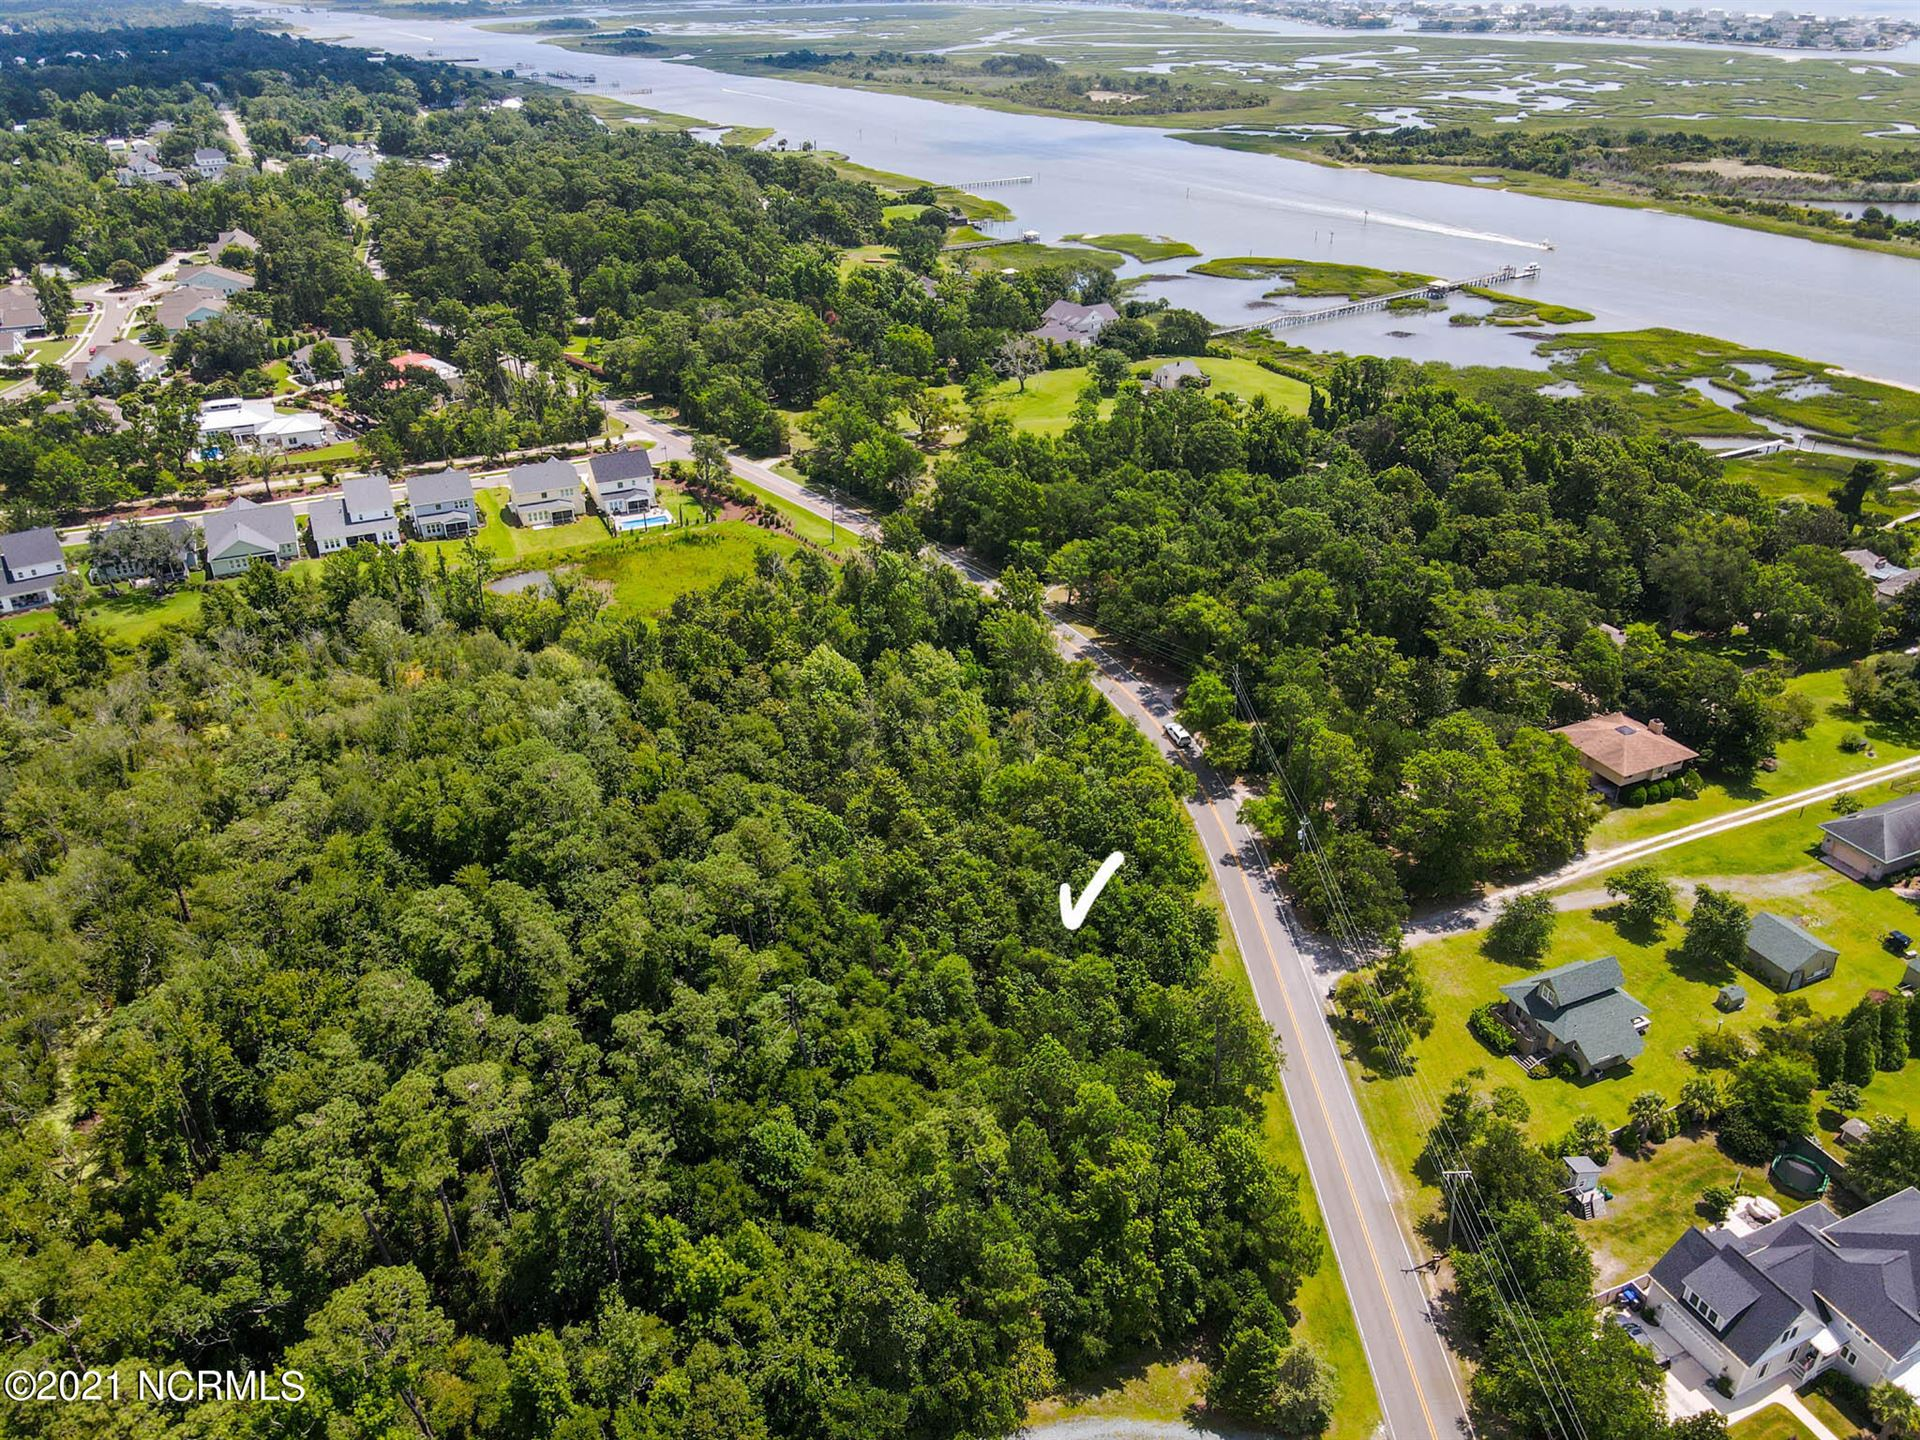 Photo of 2414 Middle Sound Loop Road, Wilmington, NC 28411 (MLS # 100280593)